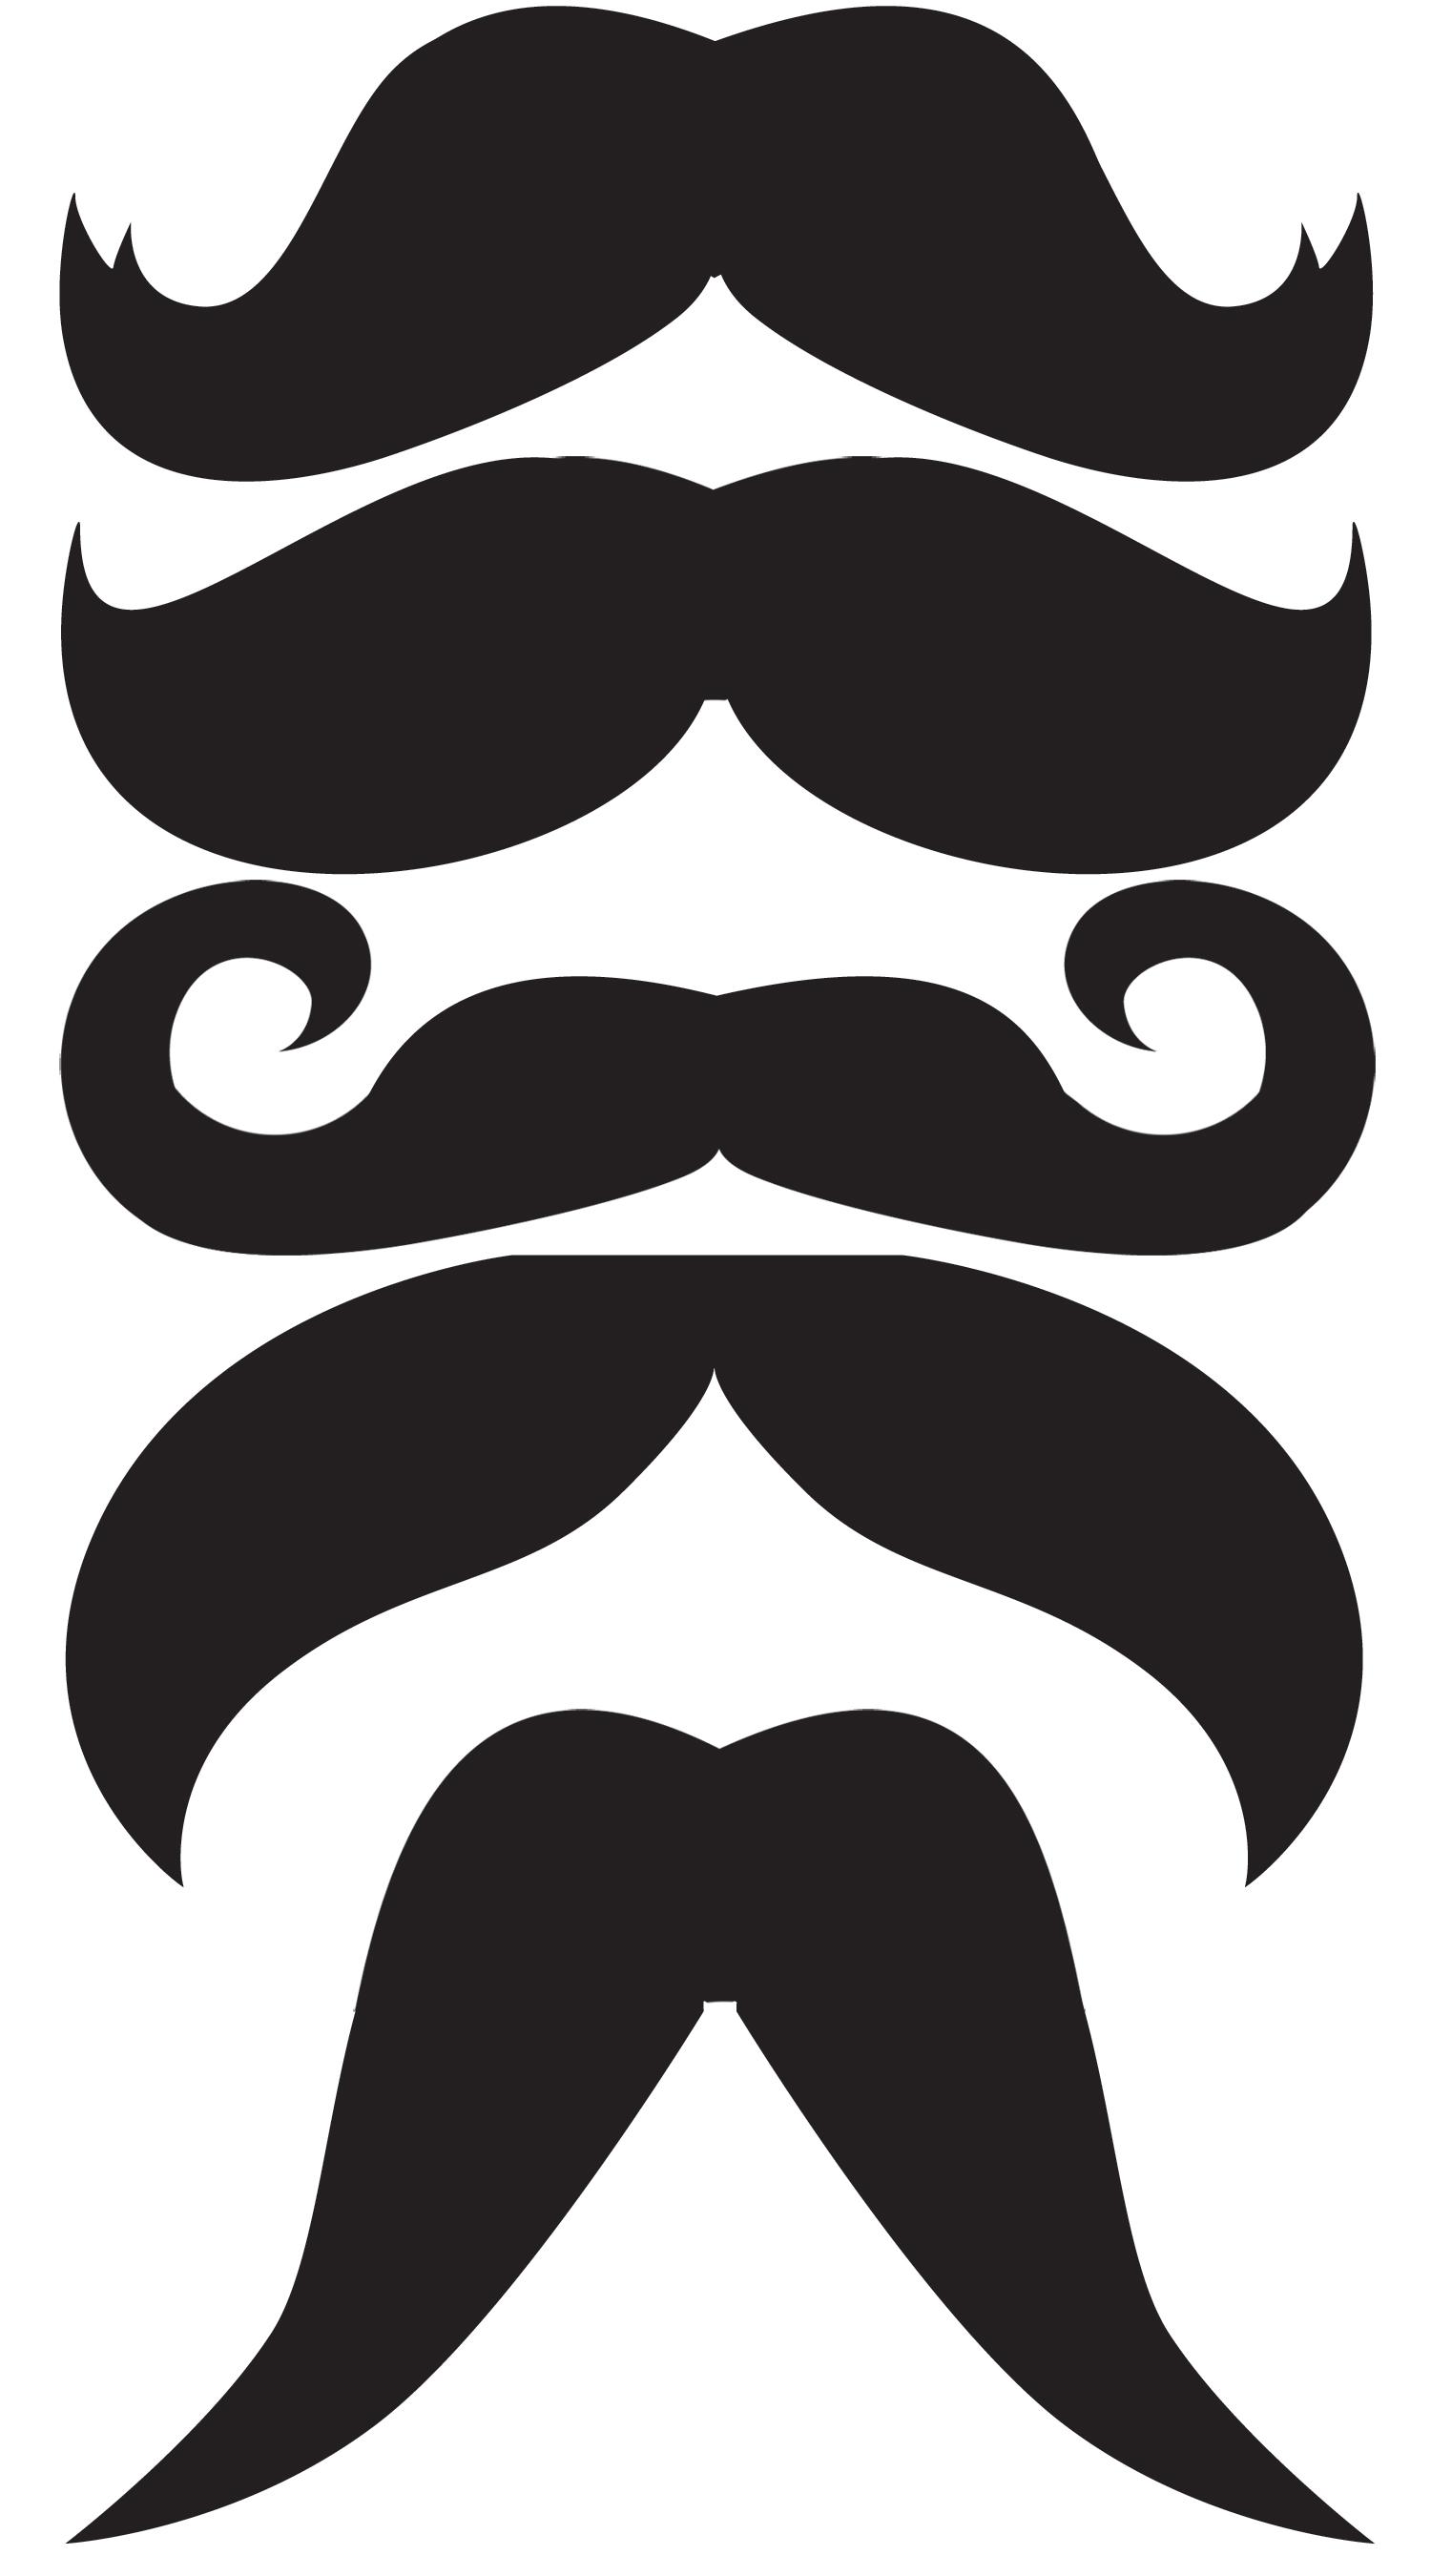 free vector mustache clip art - photo #33